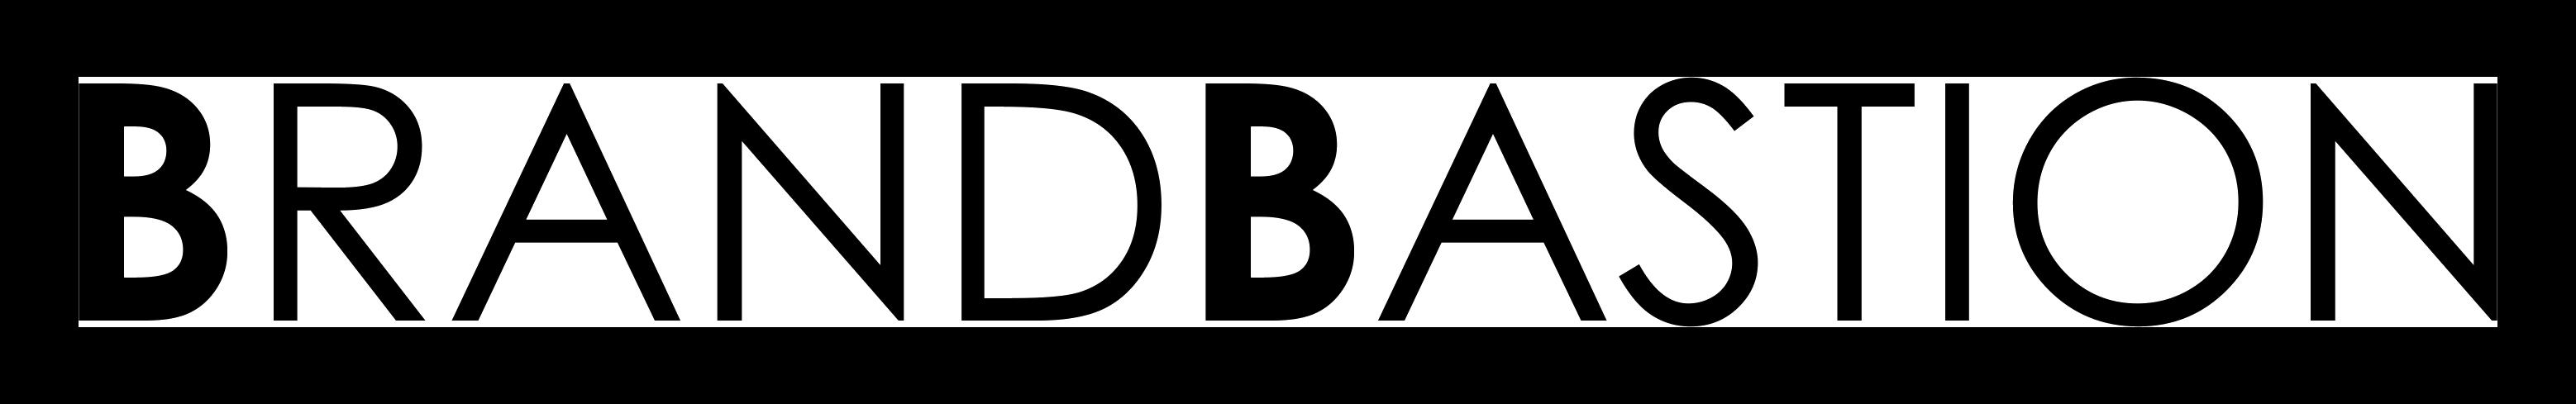 BrandBastion_logo_transparent-1